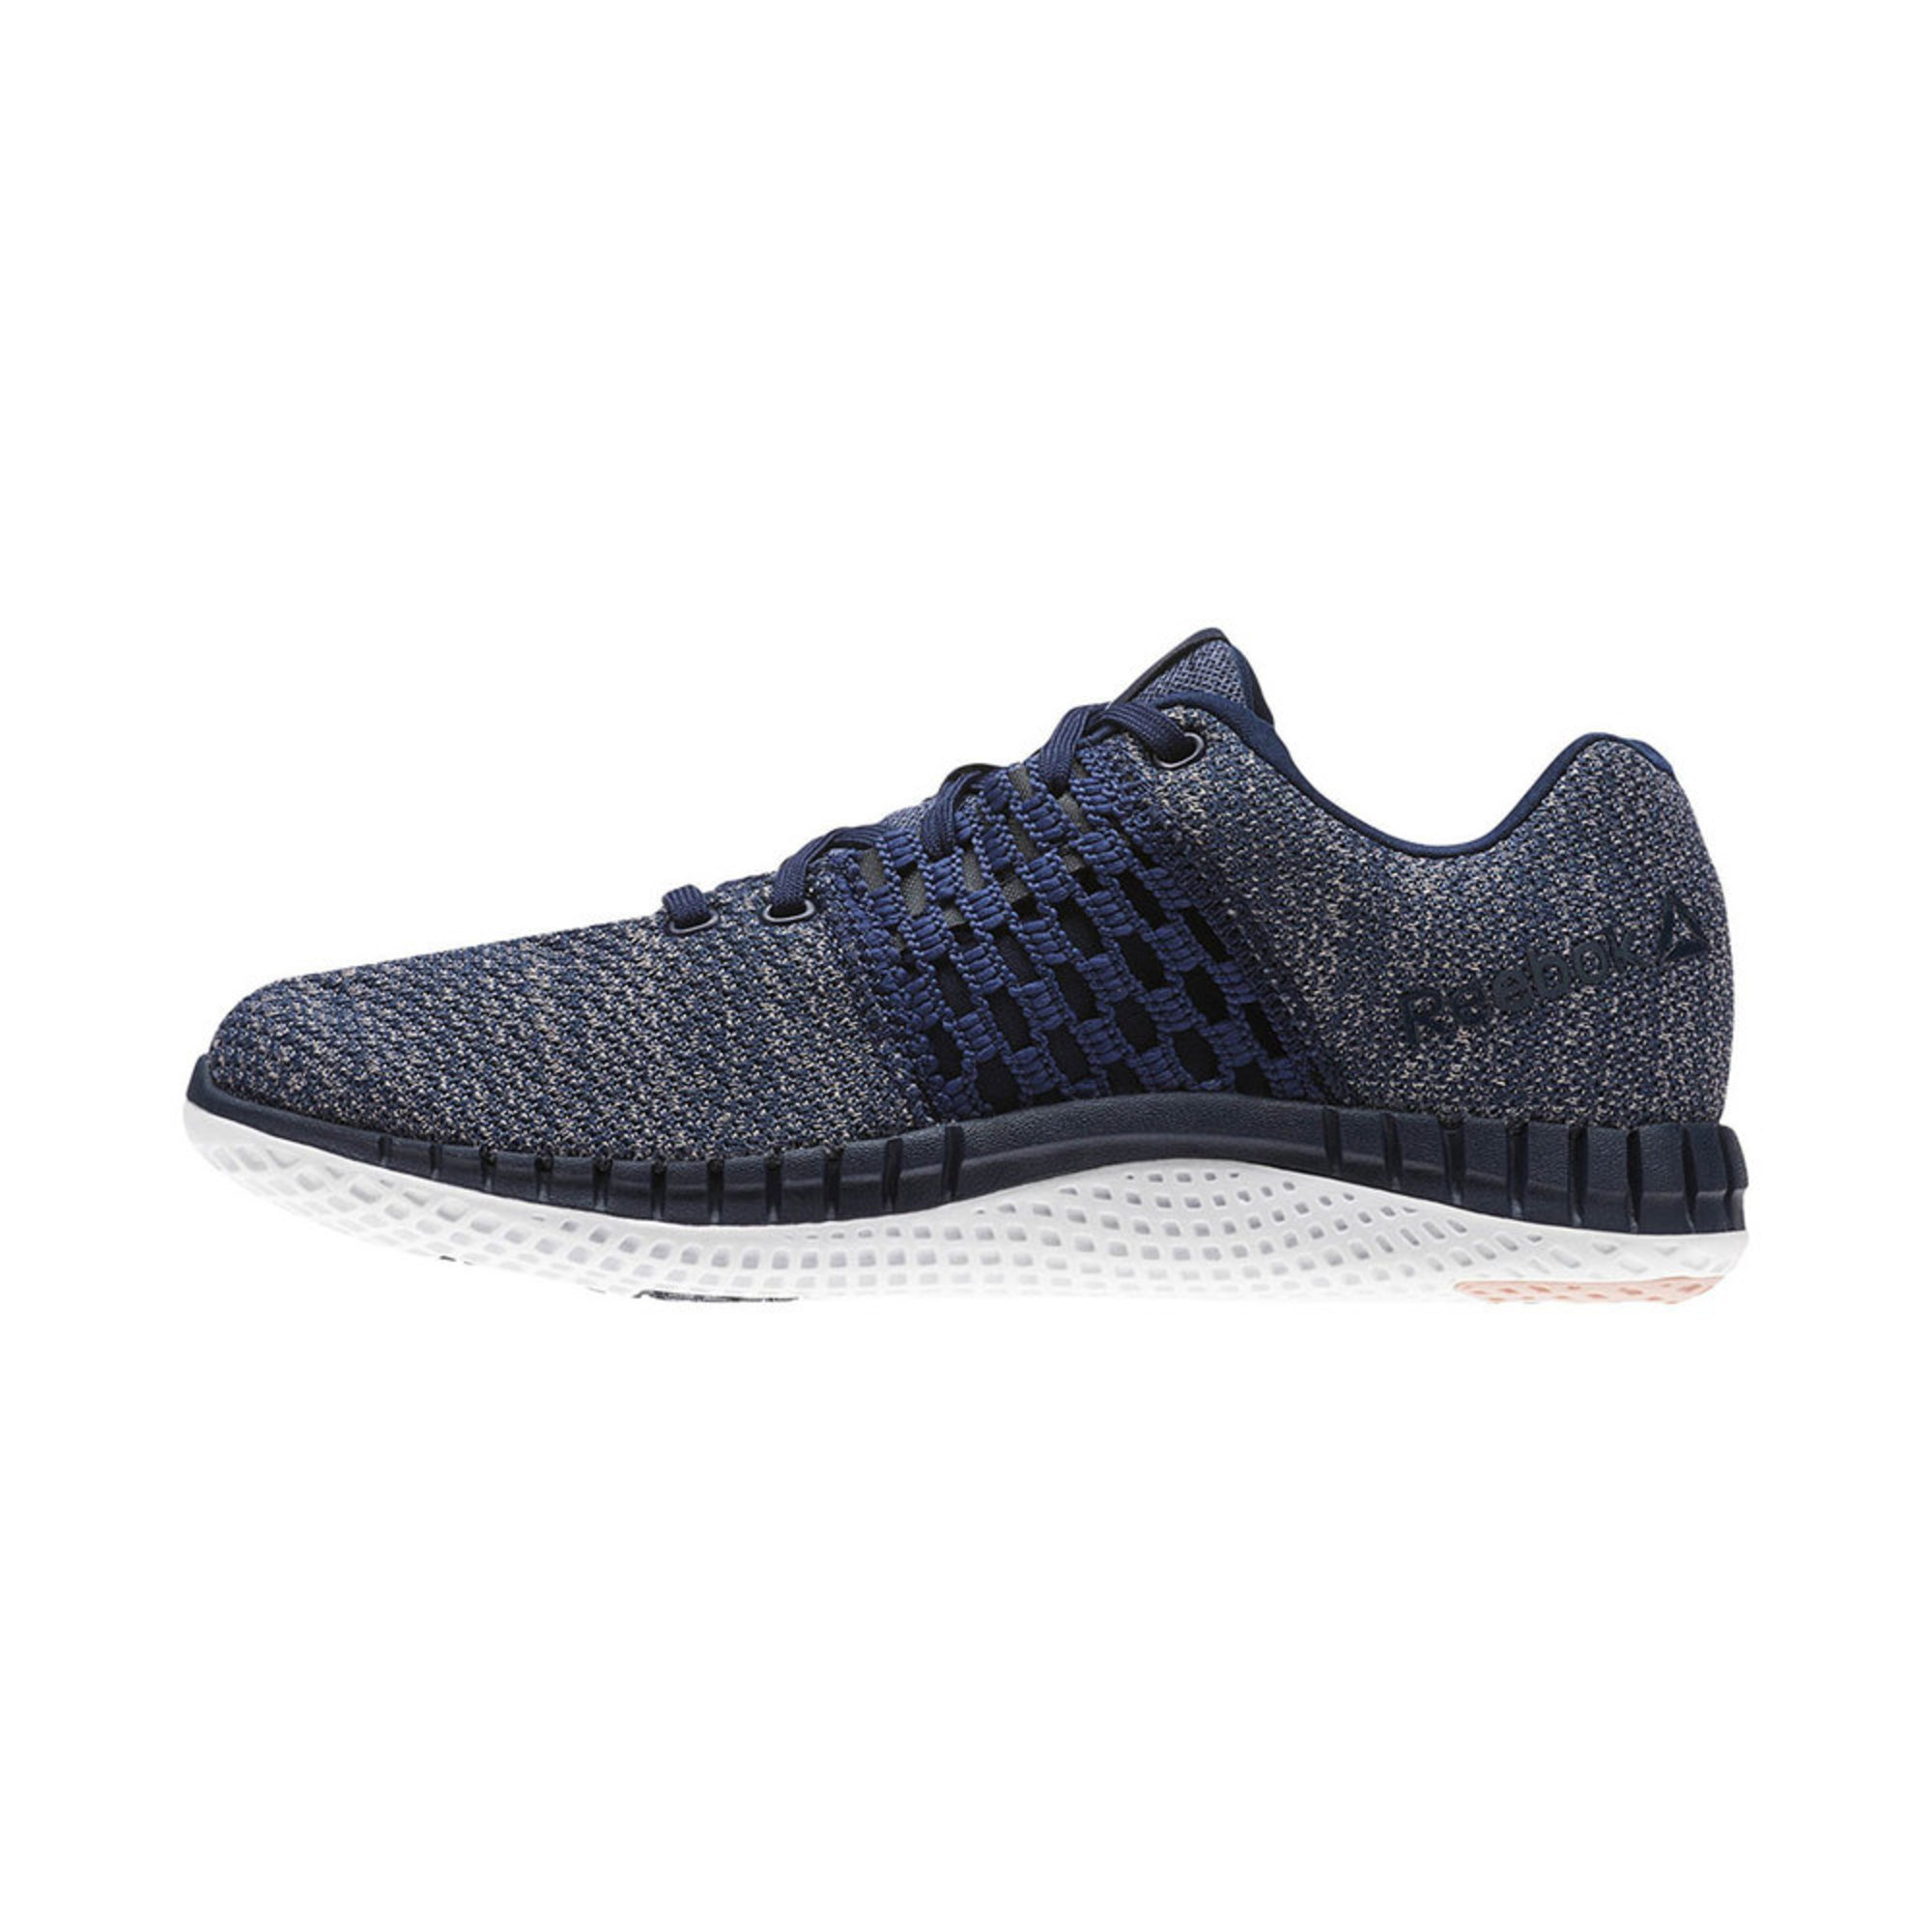 627209a9c227 Reebok. Reebok Women s Print Run ULTK Running Shoe